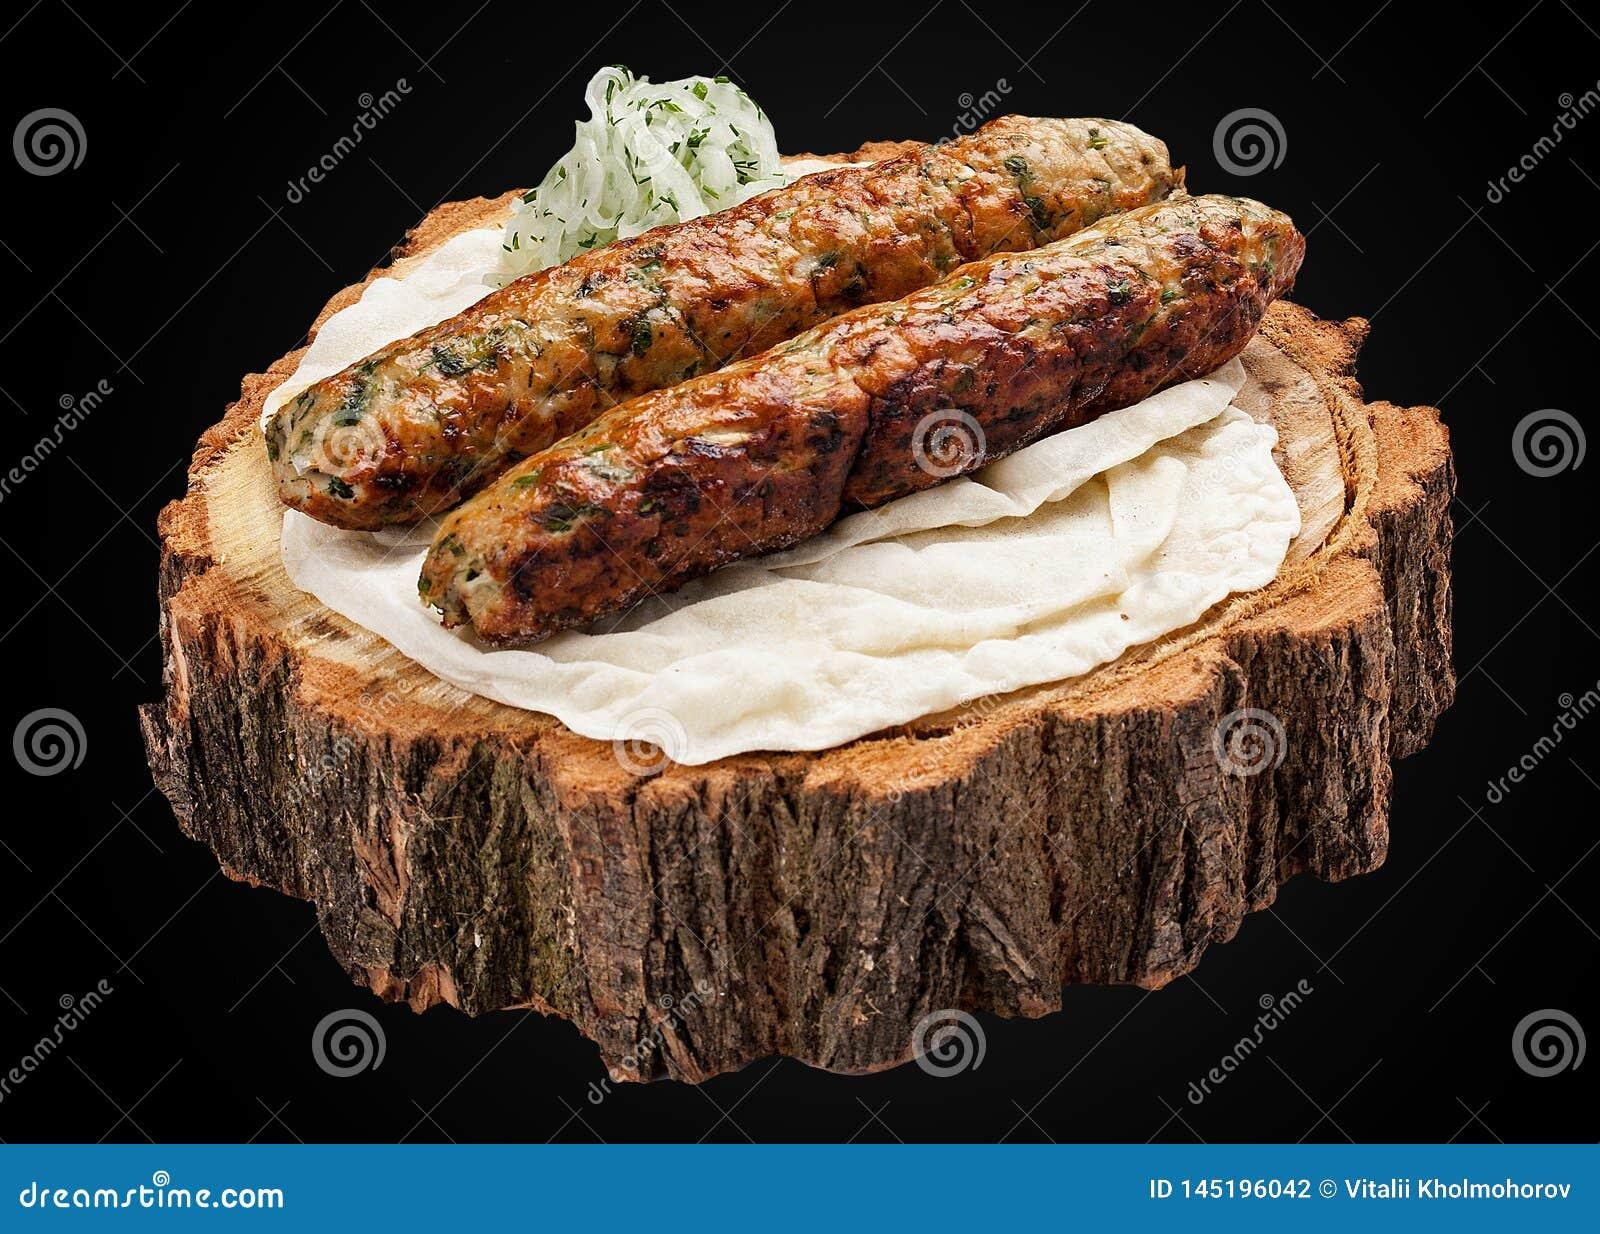 Kebab of chicken on a wooden slice